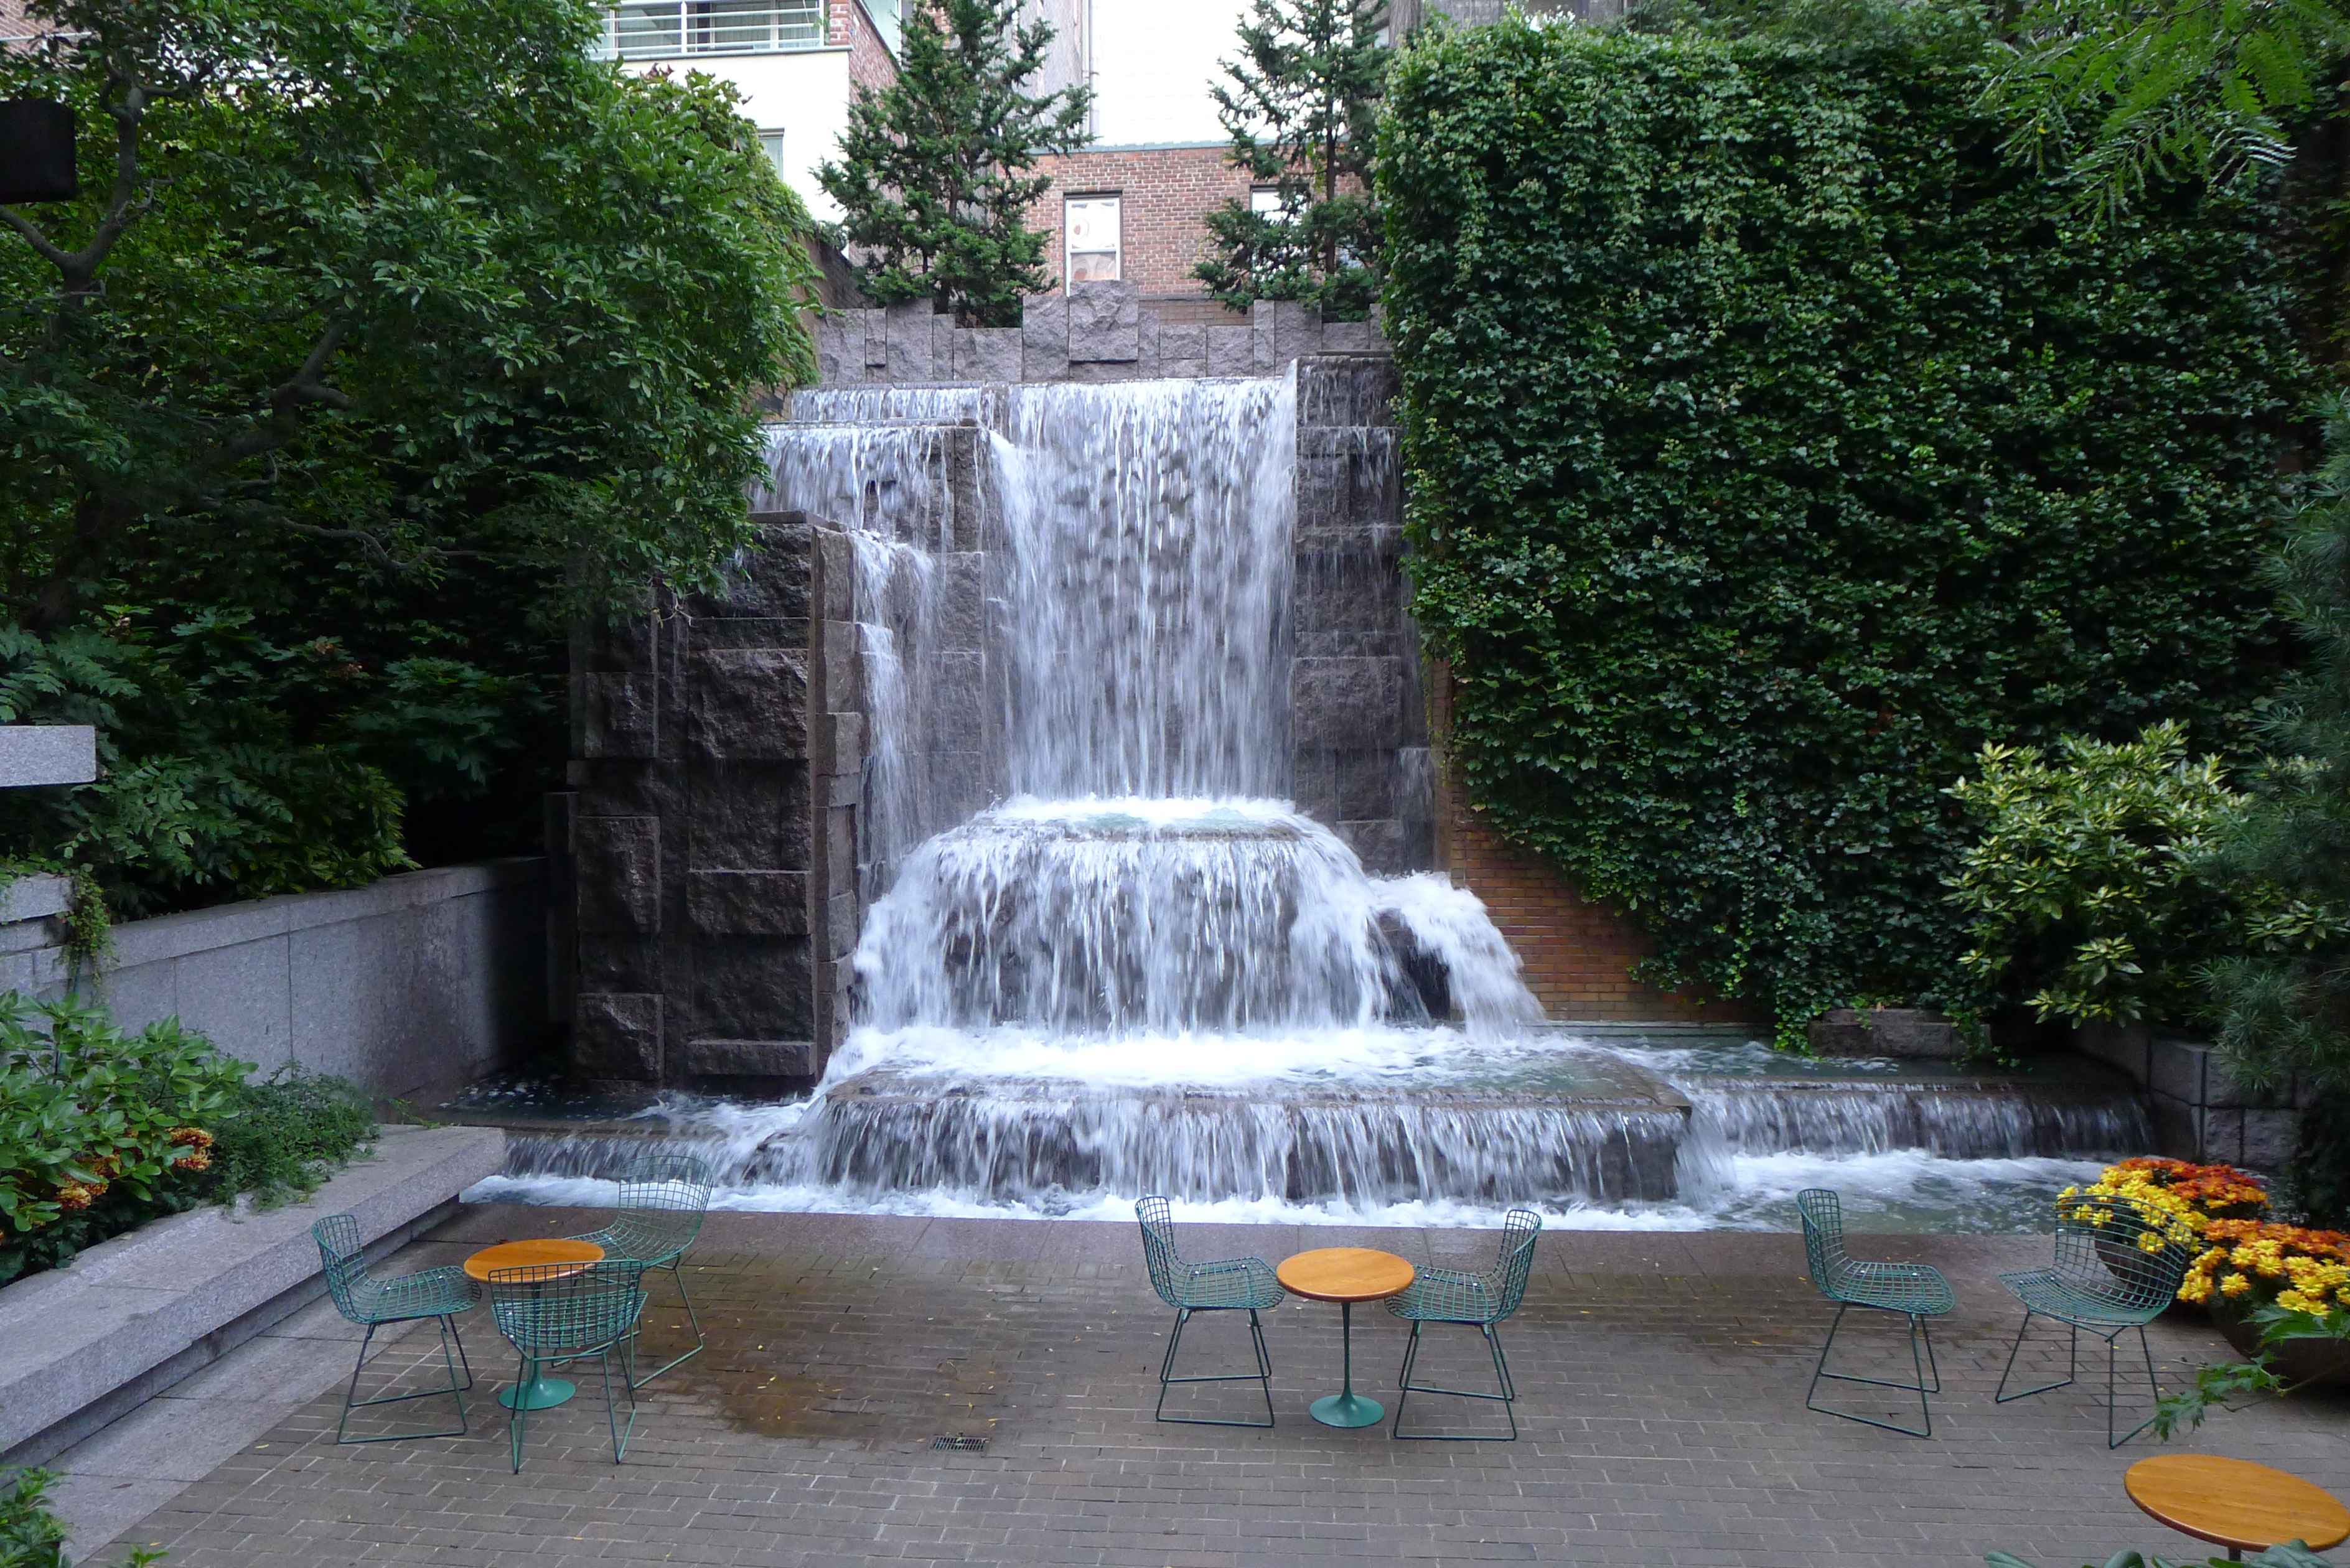 Greenacre Park